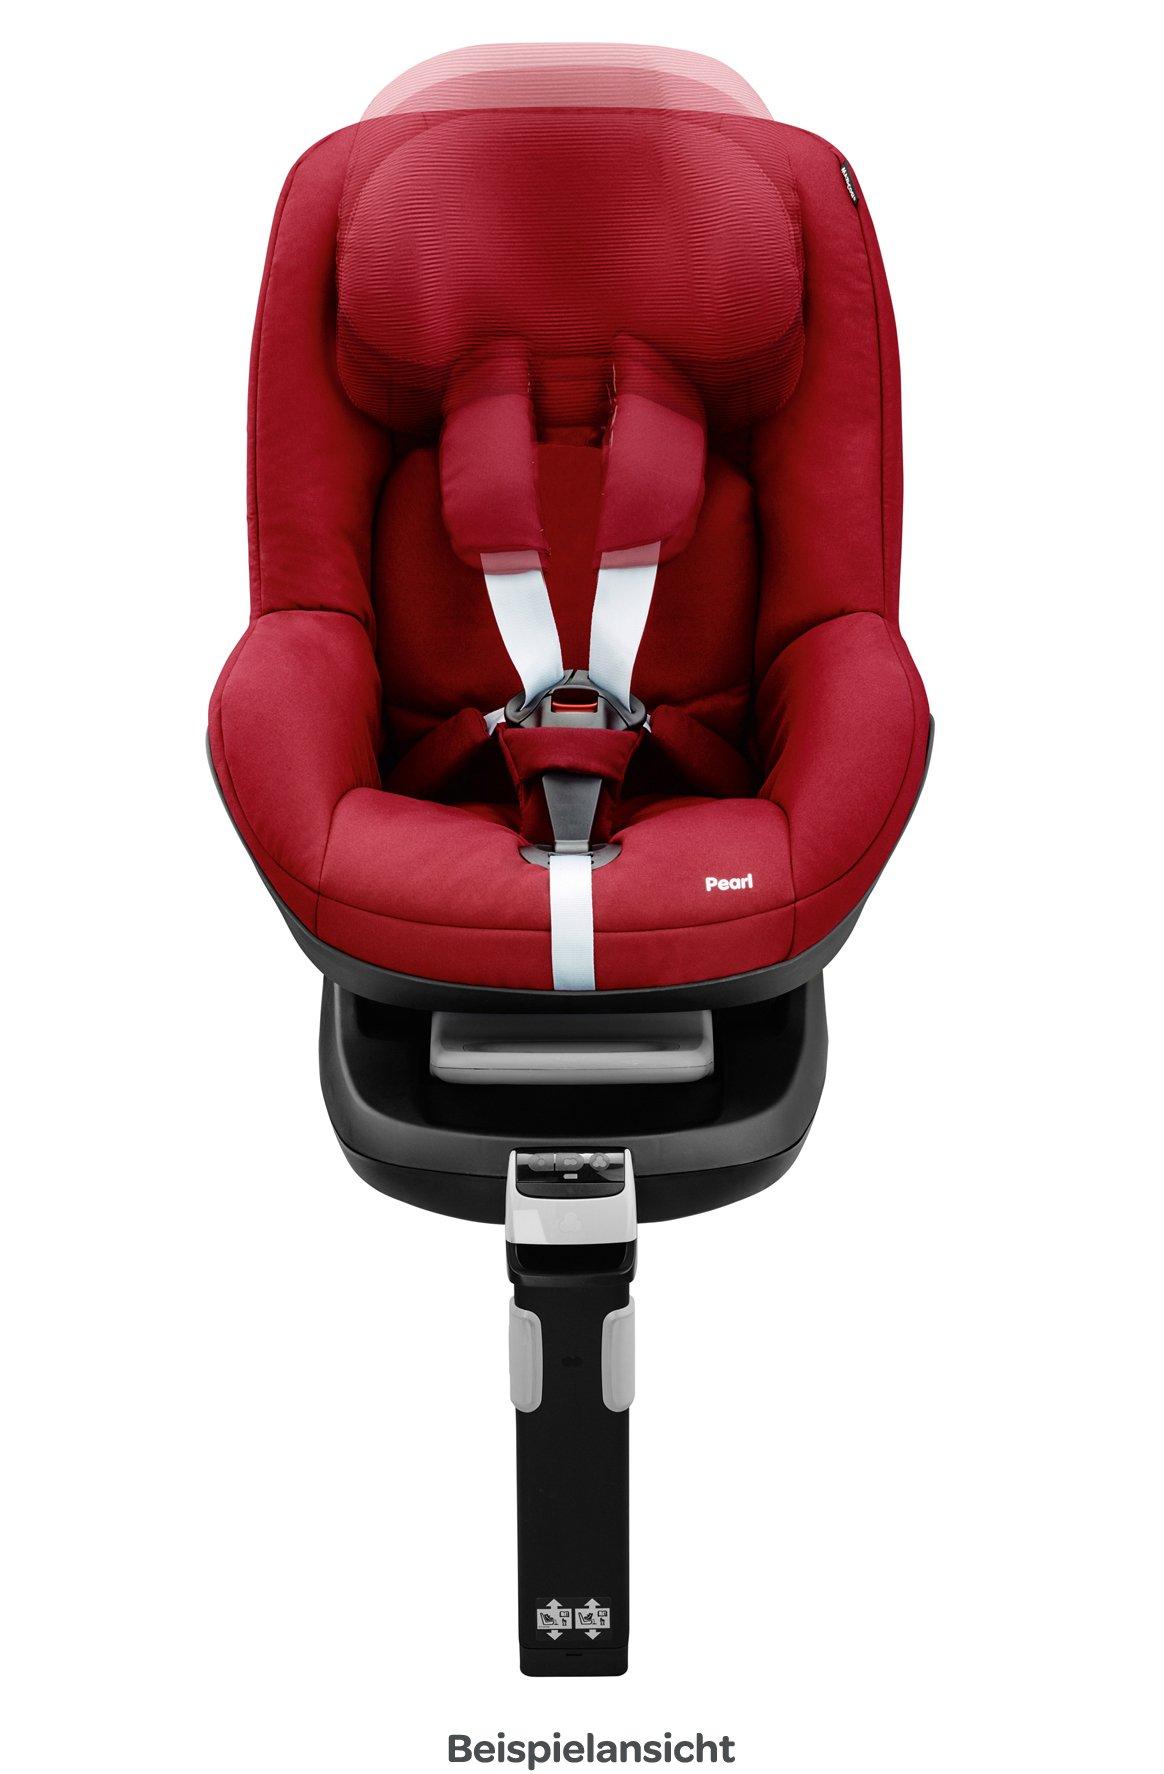 Maxi-Cosi 63409641Pearl Children's Seat, Group 1, 9-18kg Maxi-Cosi  15